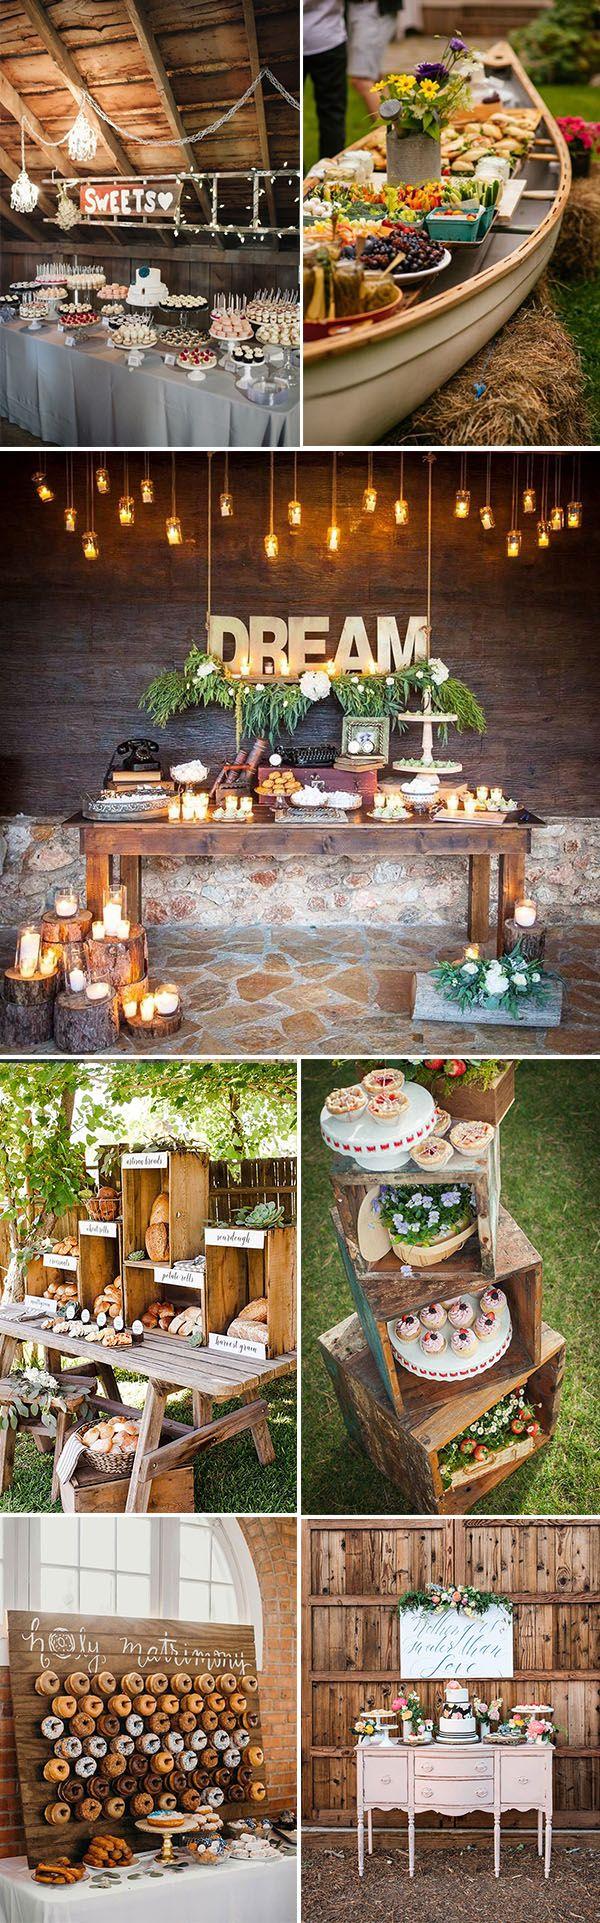 26 inspiring wedding food dessert table ideas